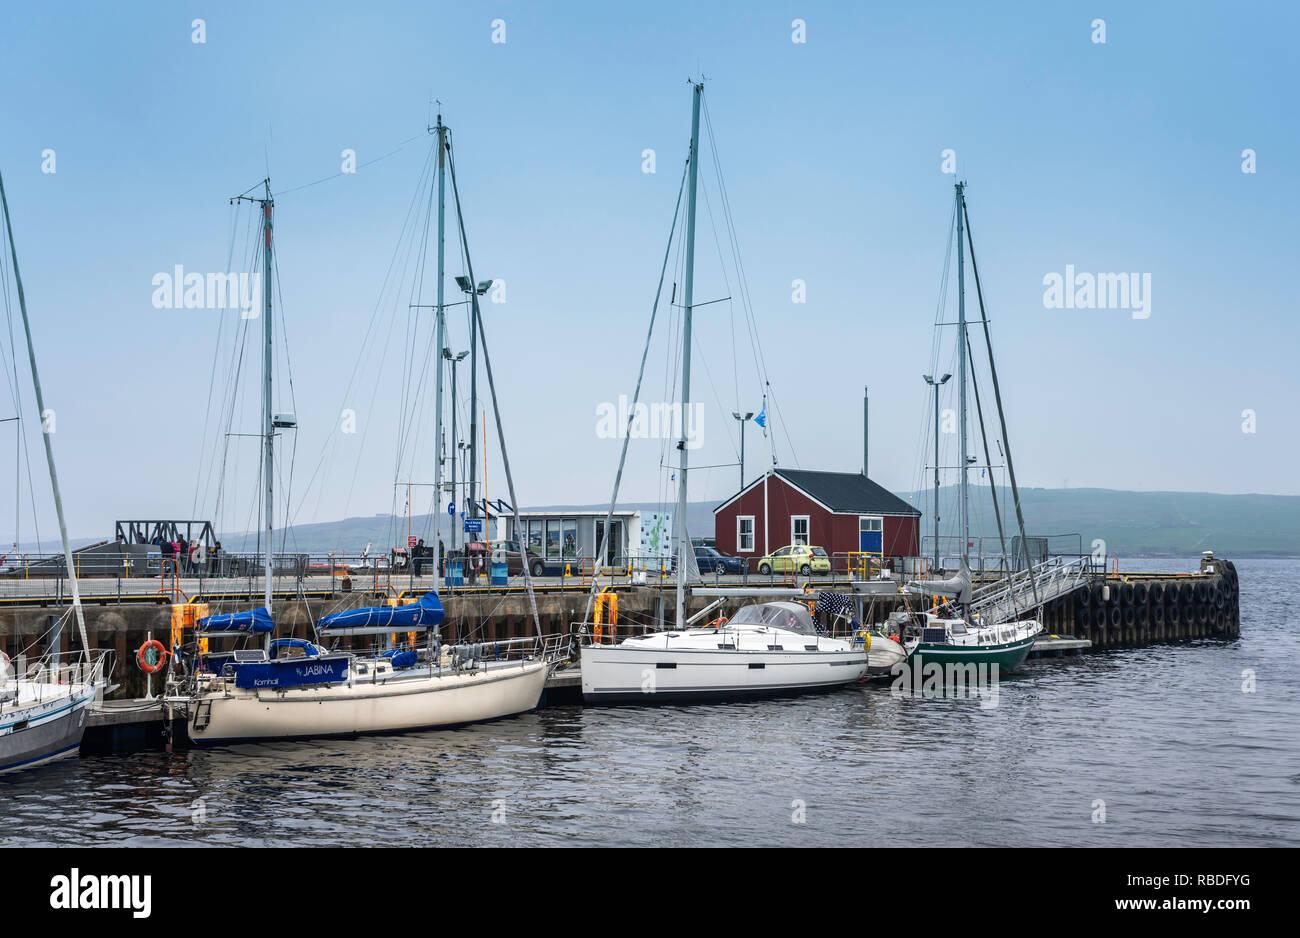 The dock with boats at the port city of Lerwick, Shetland, Scotland, United Kingdom, Europe. - Stock Image